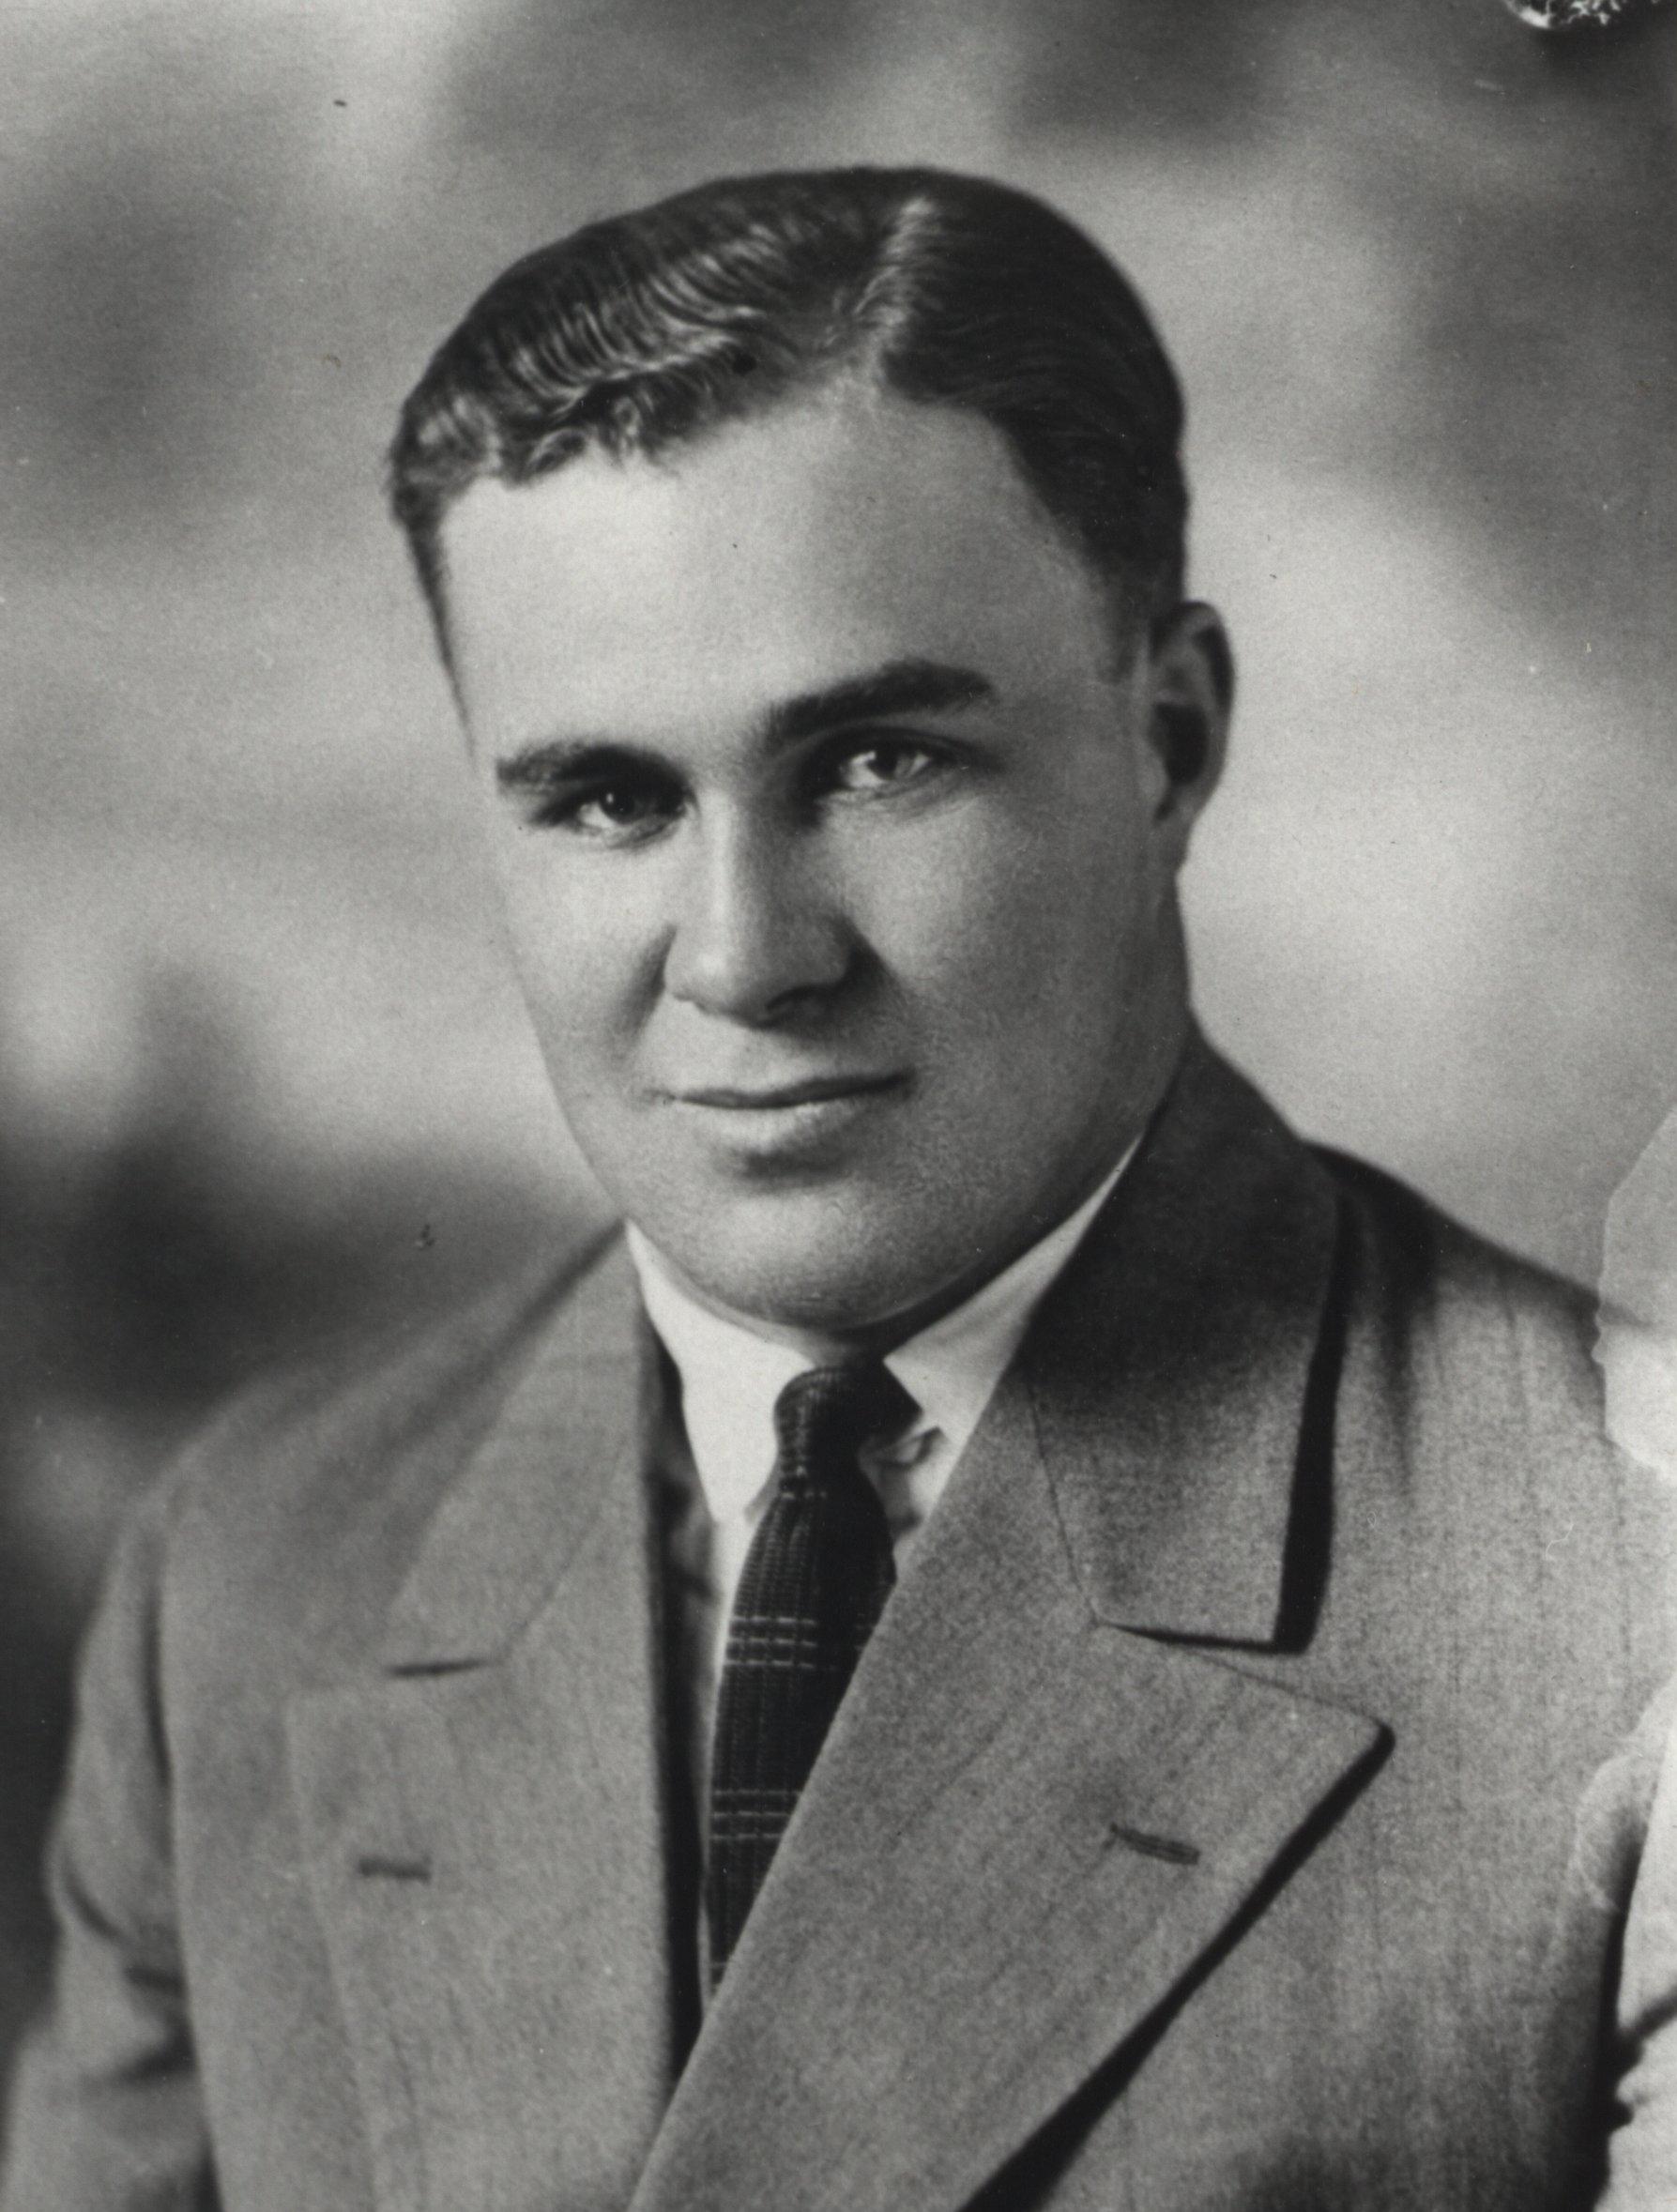 Andersen, Willard John